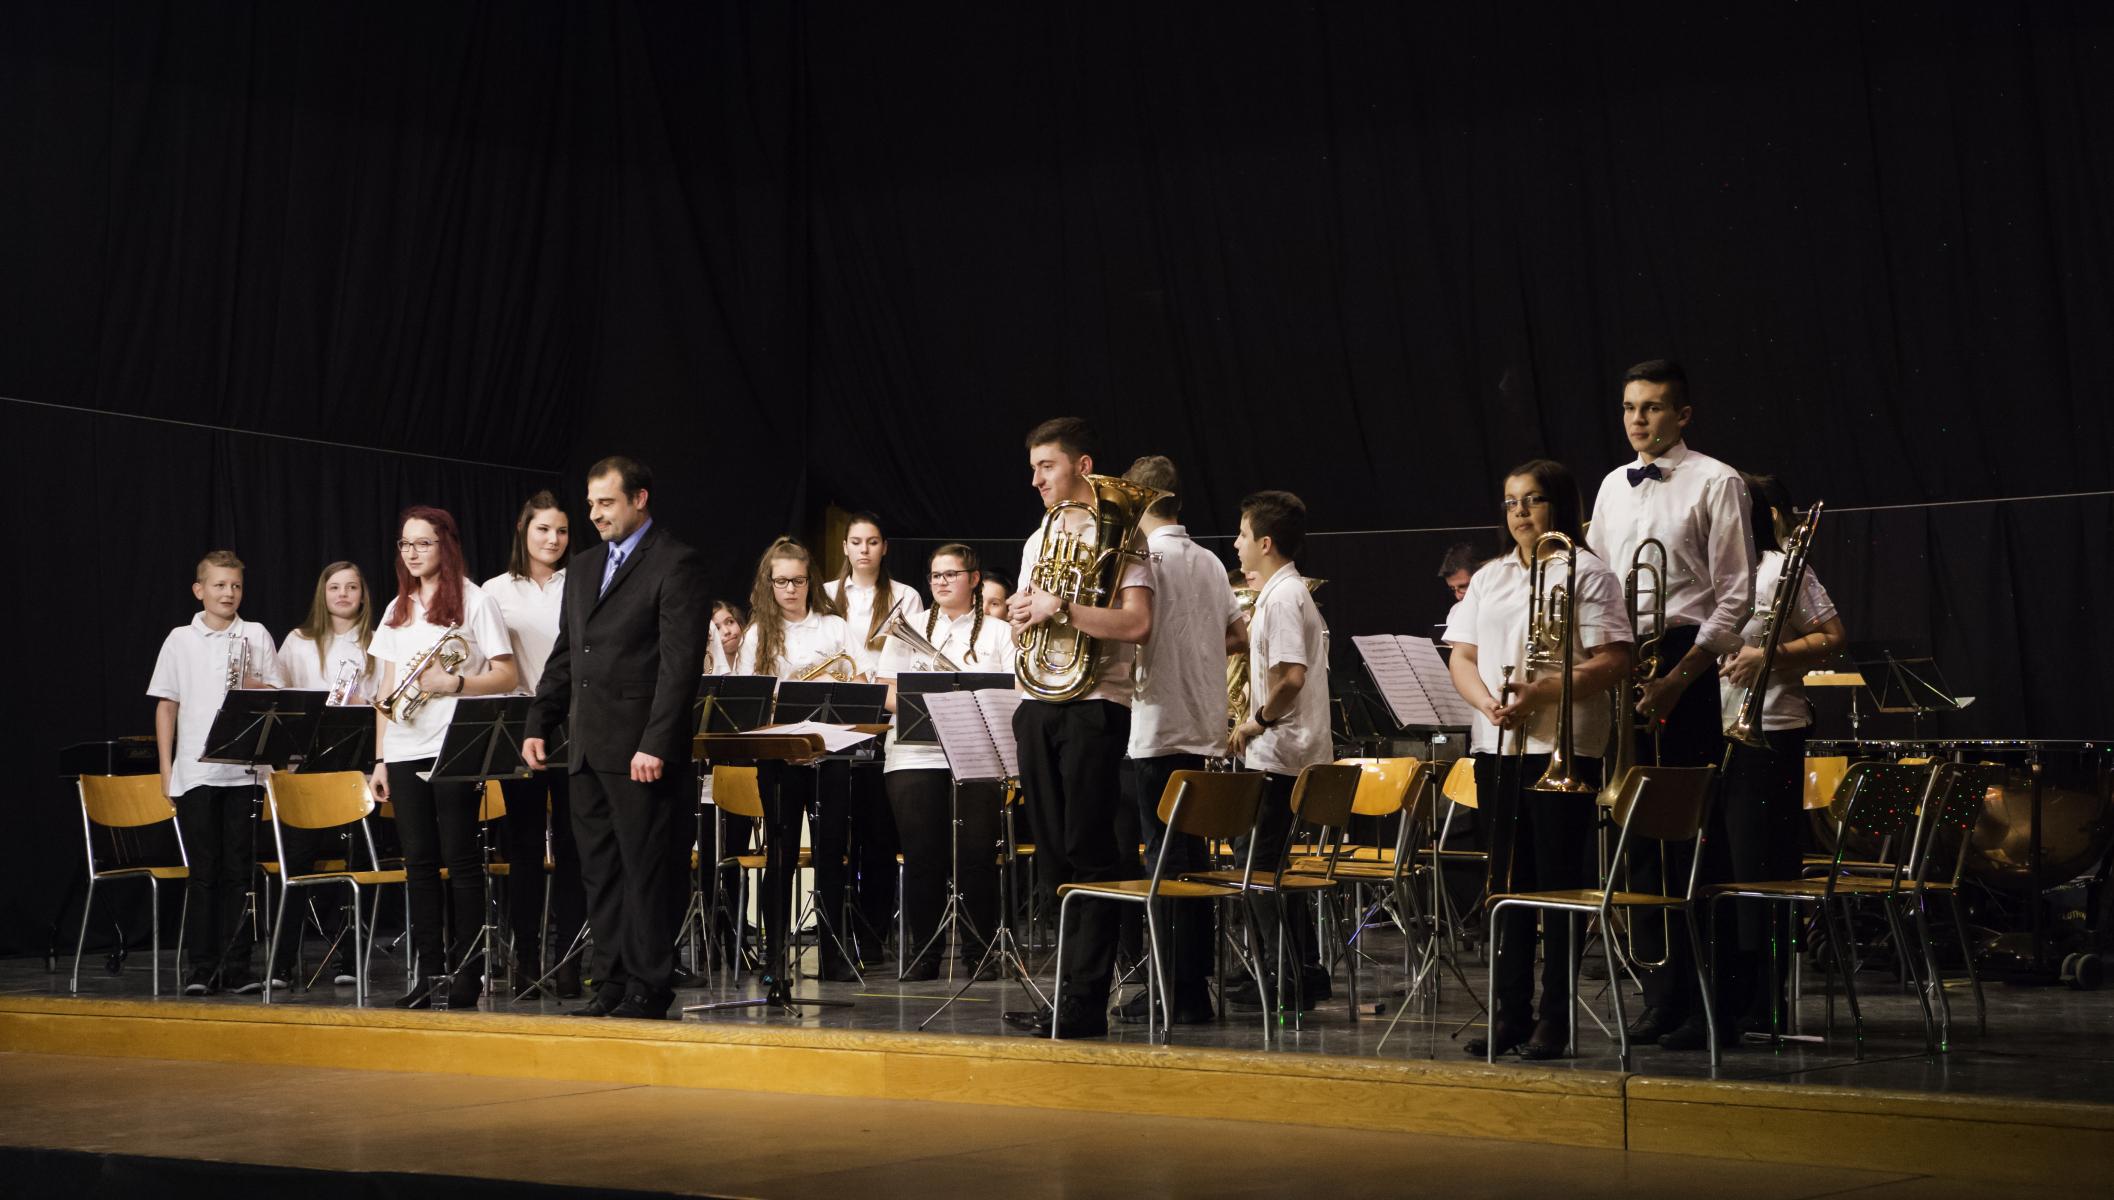 170211_concert_annuel17-015